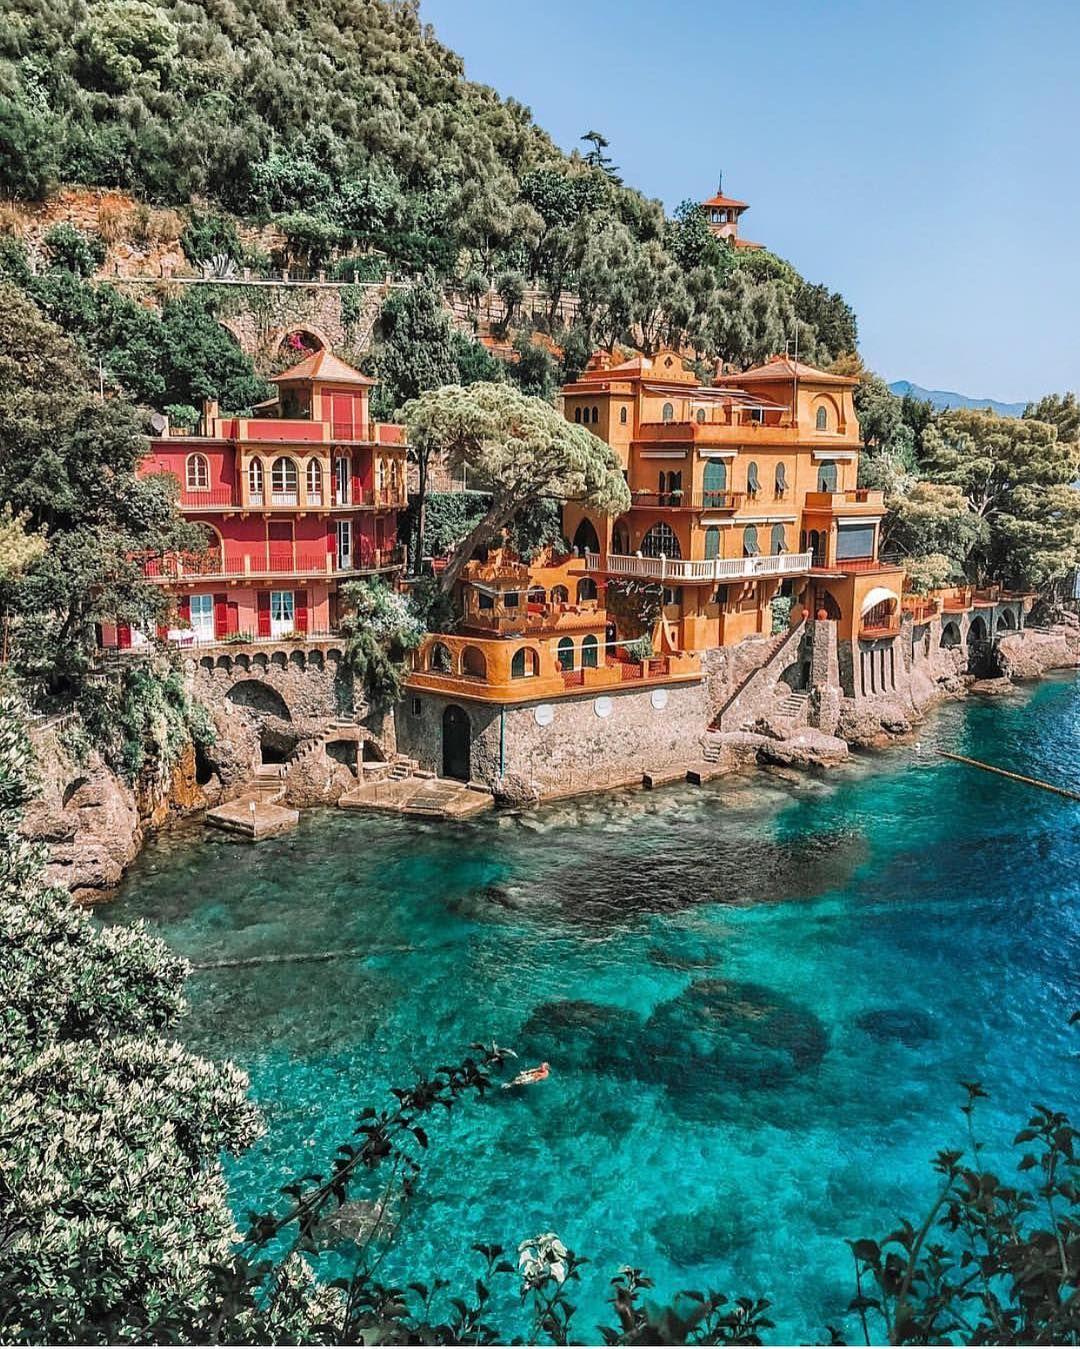 Positano, Italia                                                #fotografía #mundo #viaje #paisaje #europa #océano #casas #pintoresco